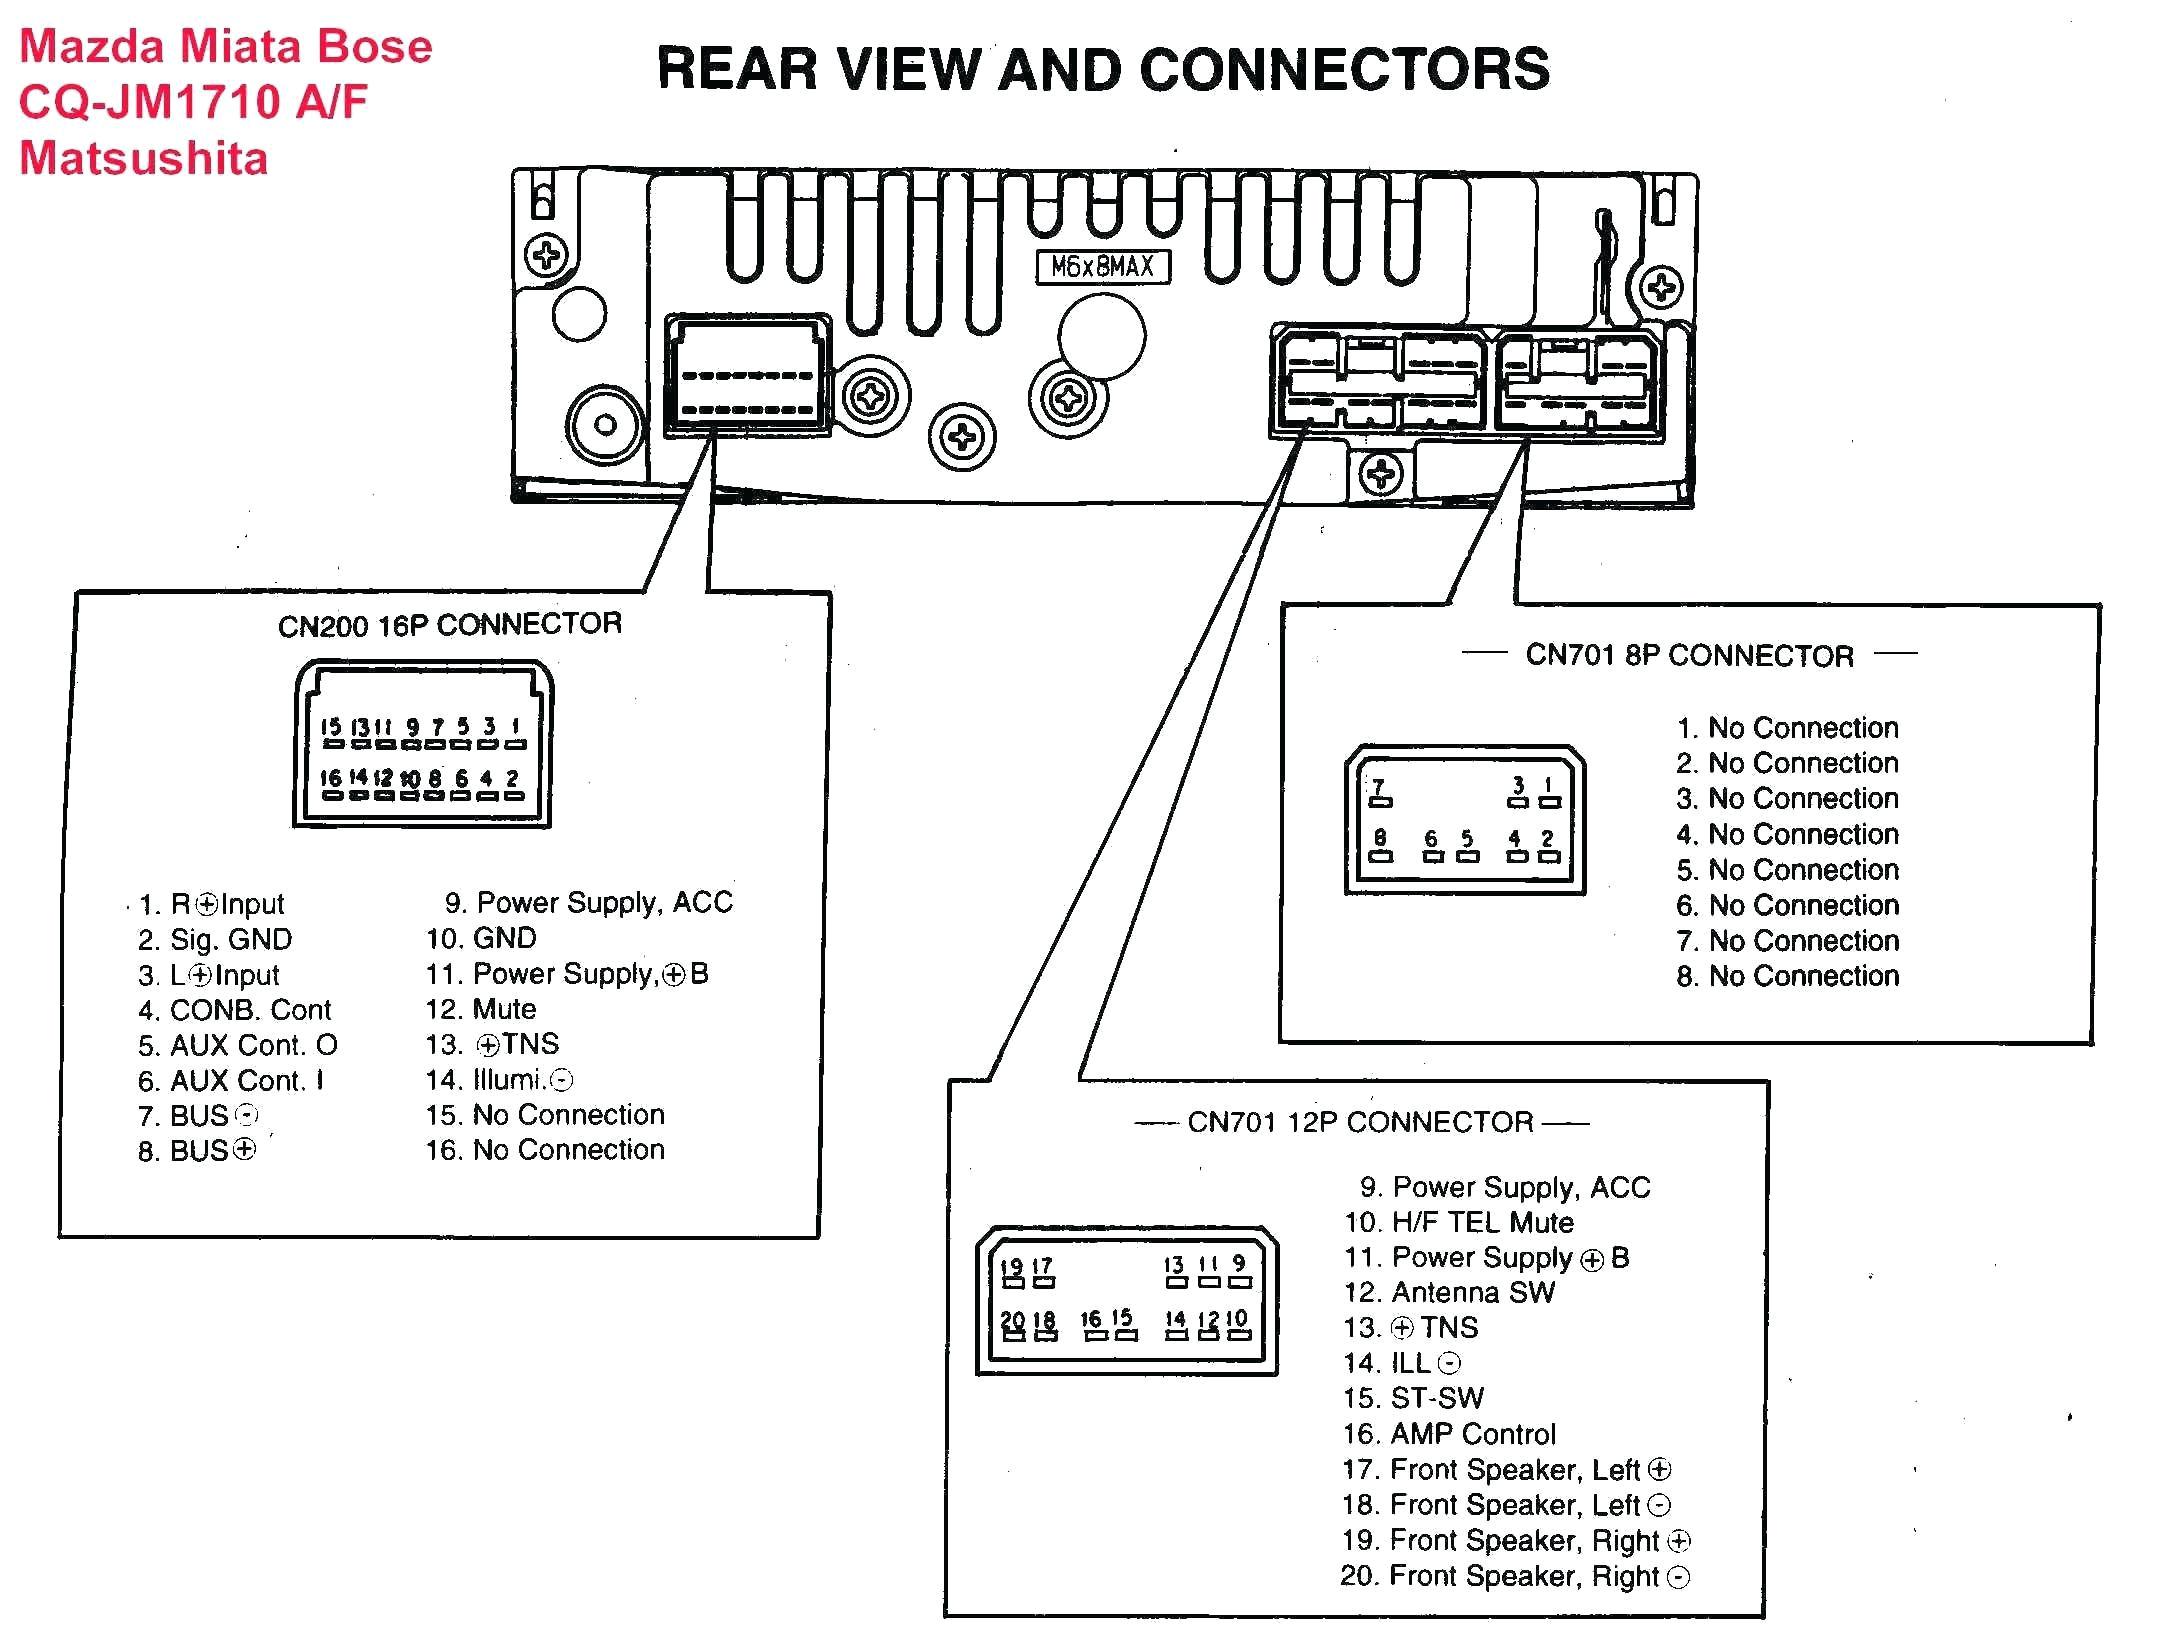 sony cdx gt330 wiring diagram autocardesign. Black Bedroom Furniture Sets. Home Design Ideas